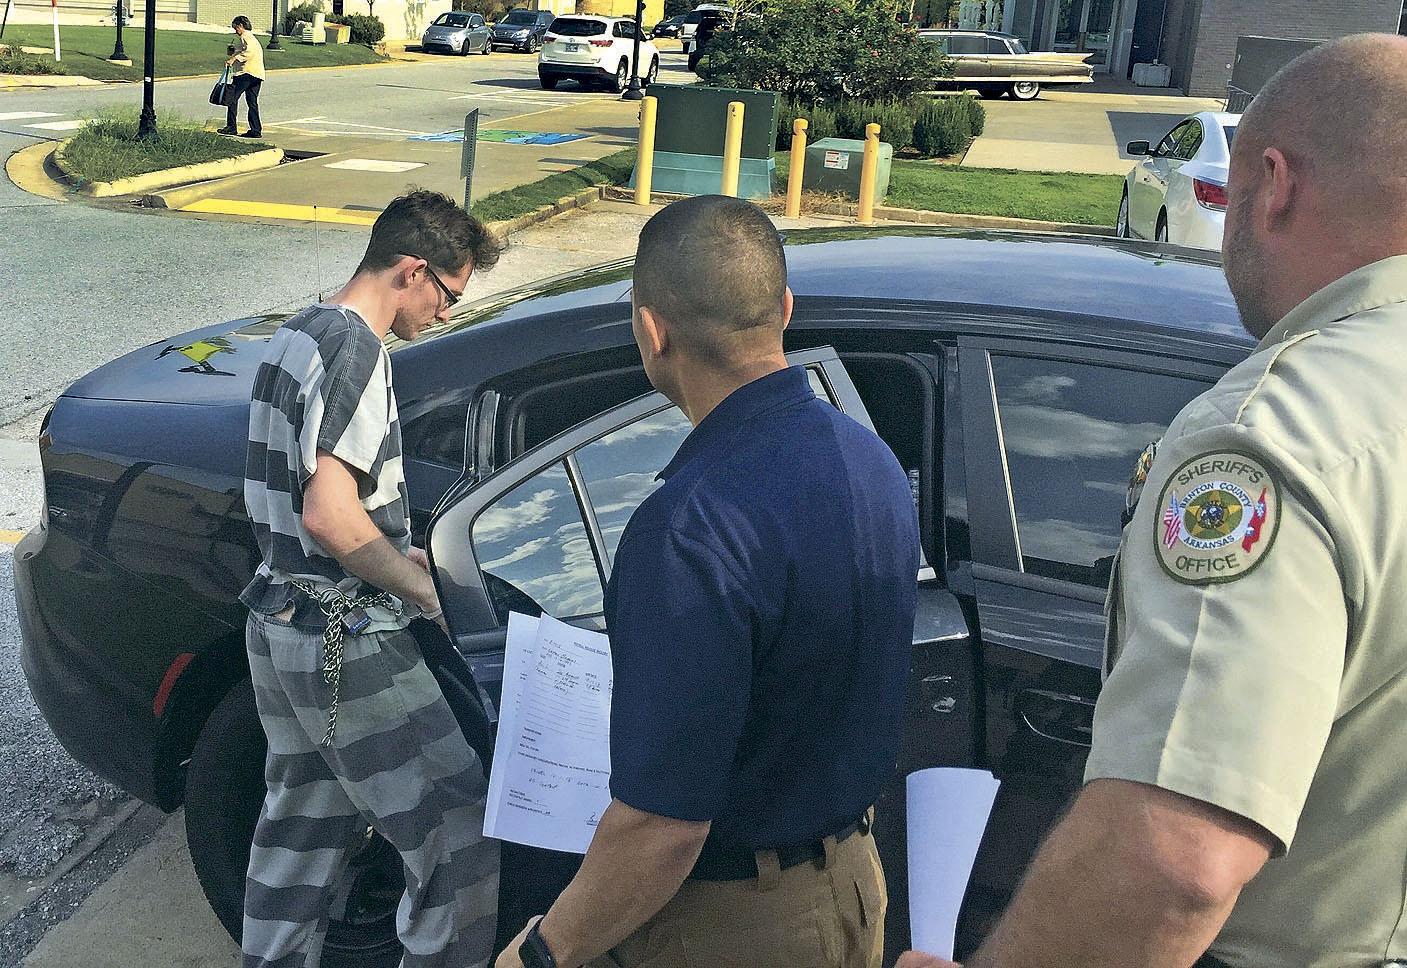 Jury trial set for former preschool worker